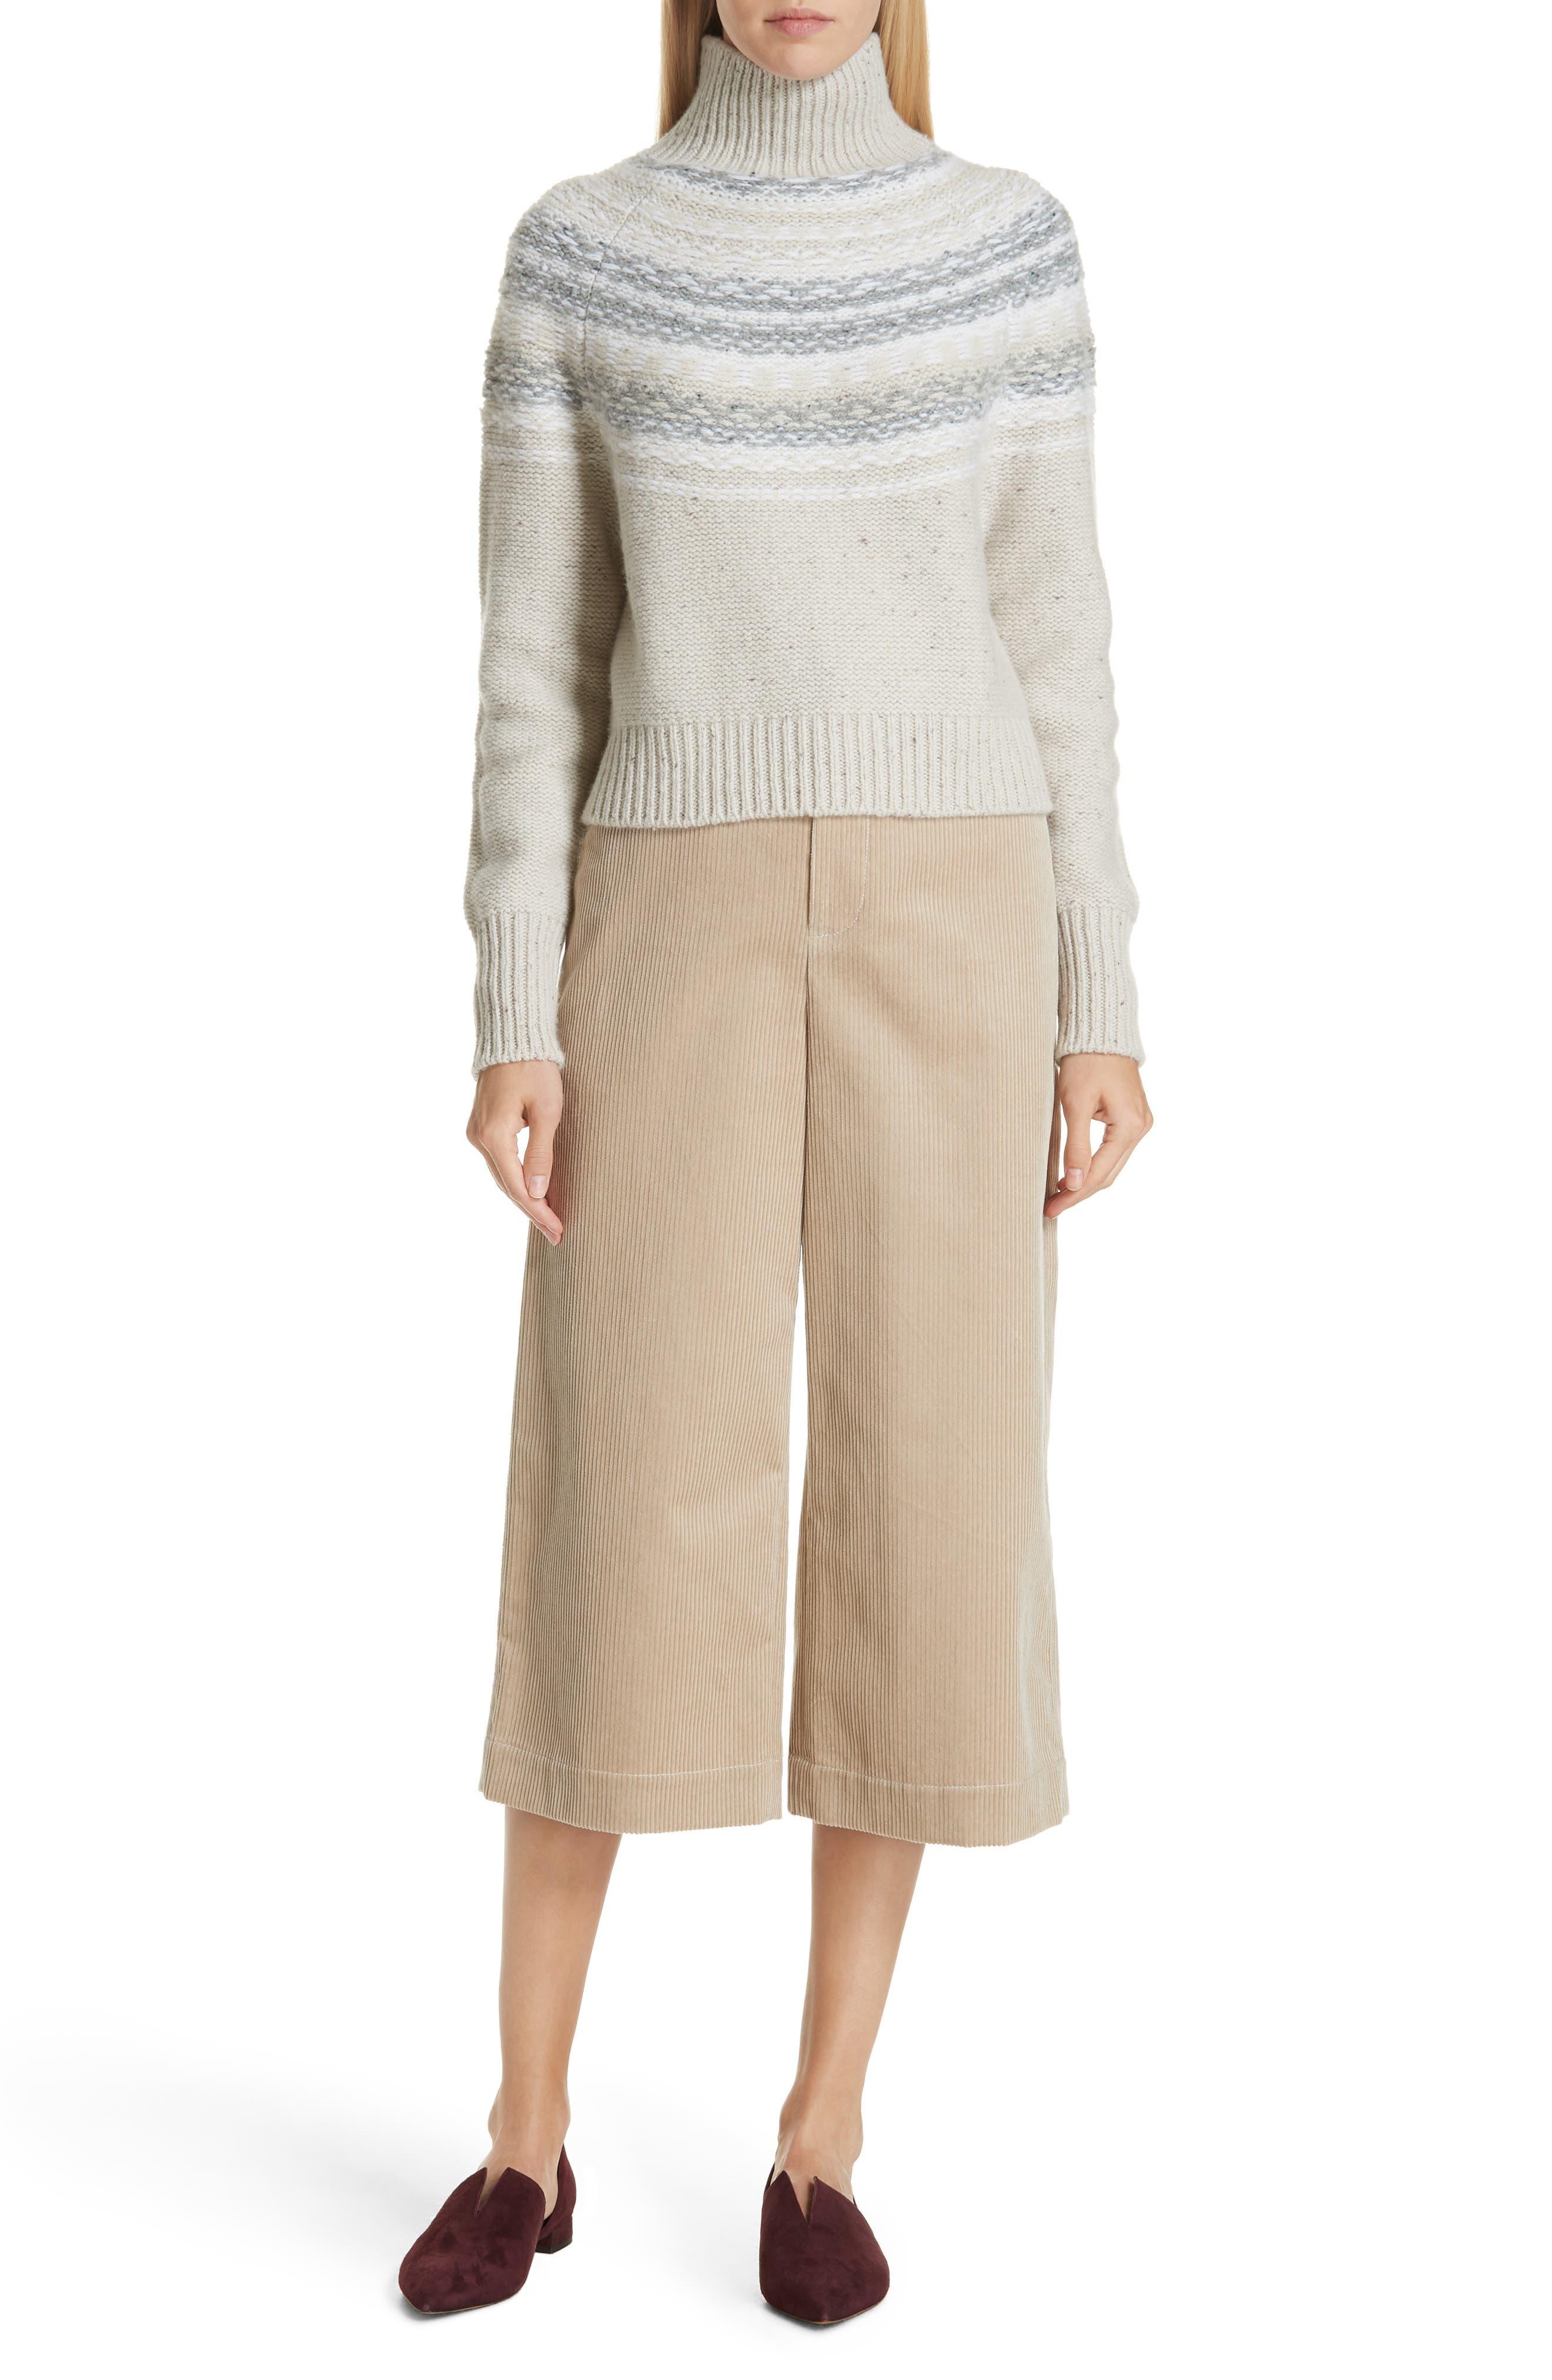 Vince Fair Isle Wool & Cashmere Crop Turtleneck Sweater, Ivory